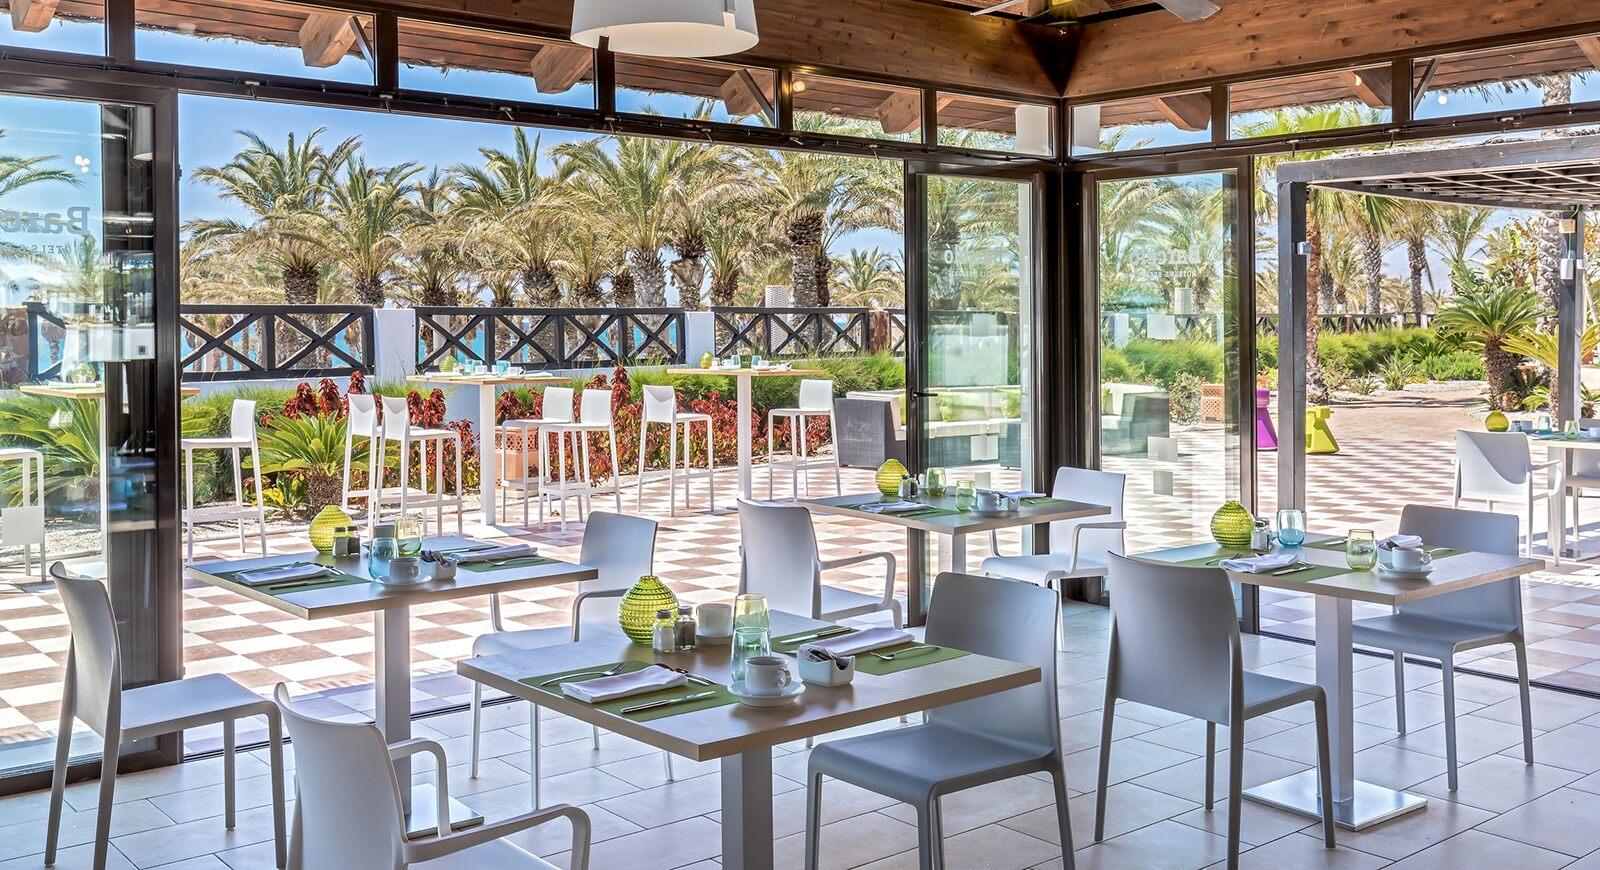 236-restaurant-121-hotel-barcelo-cabo-de-gata_tcm20-136713_w1600_h870_n.jpg